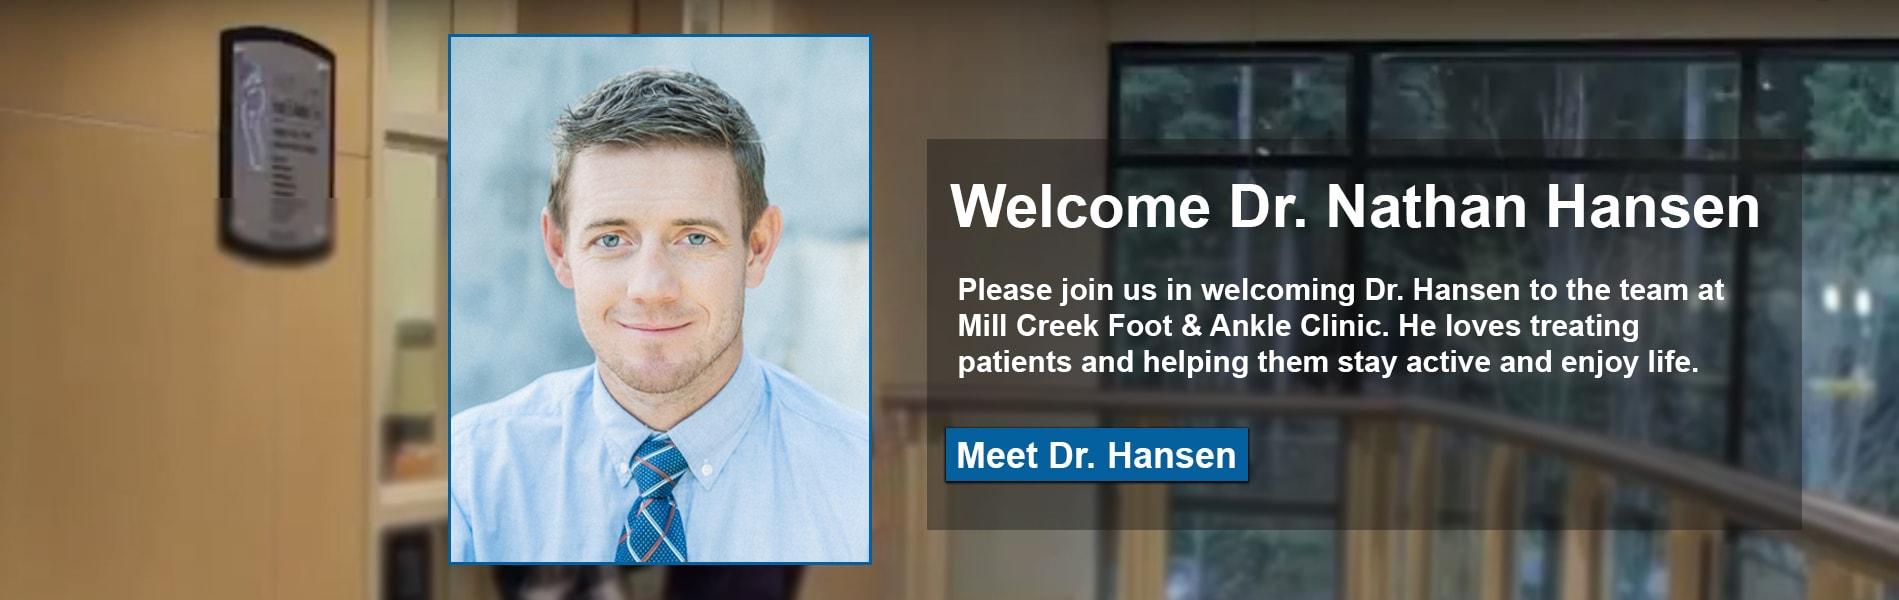 Dr.-Nathan-Hansen